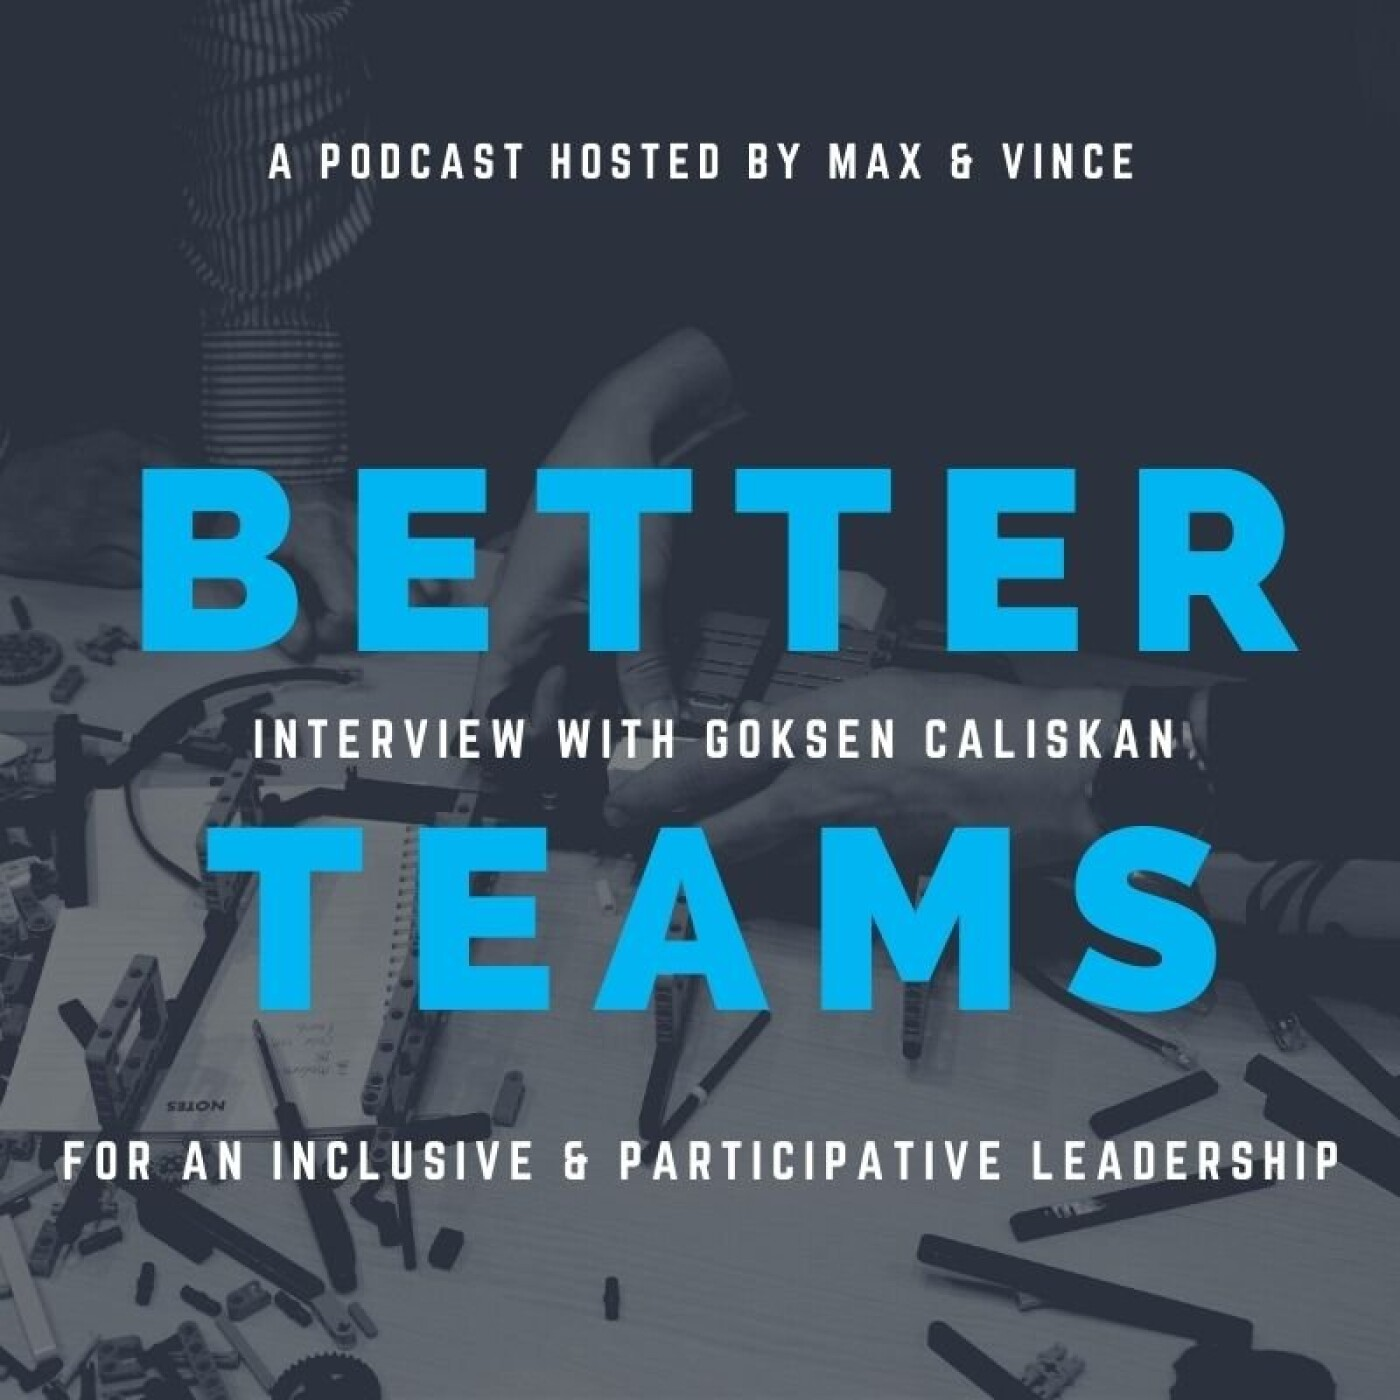 For an Inclusive and Participative Leadership - Interview with Gökşen Çalışkan